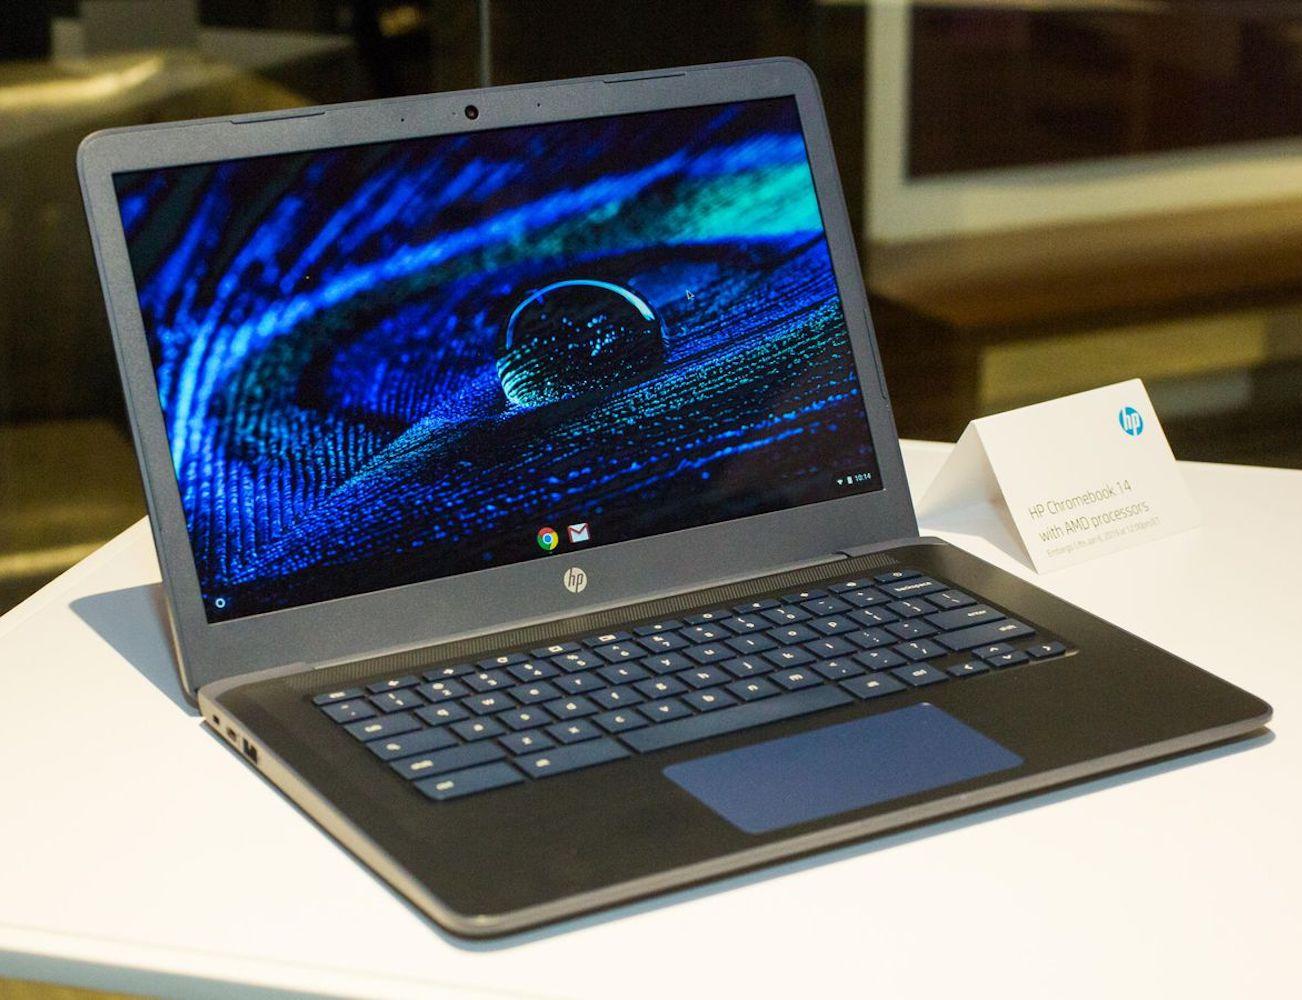 HP Chromebook 14 AMD Laptop offers super fast speeds